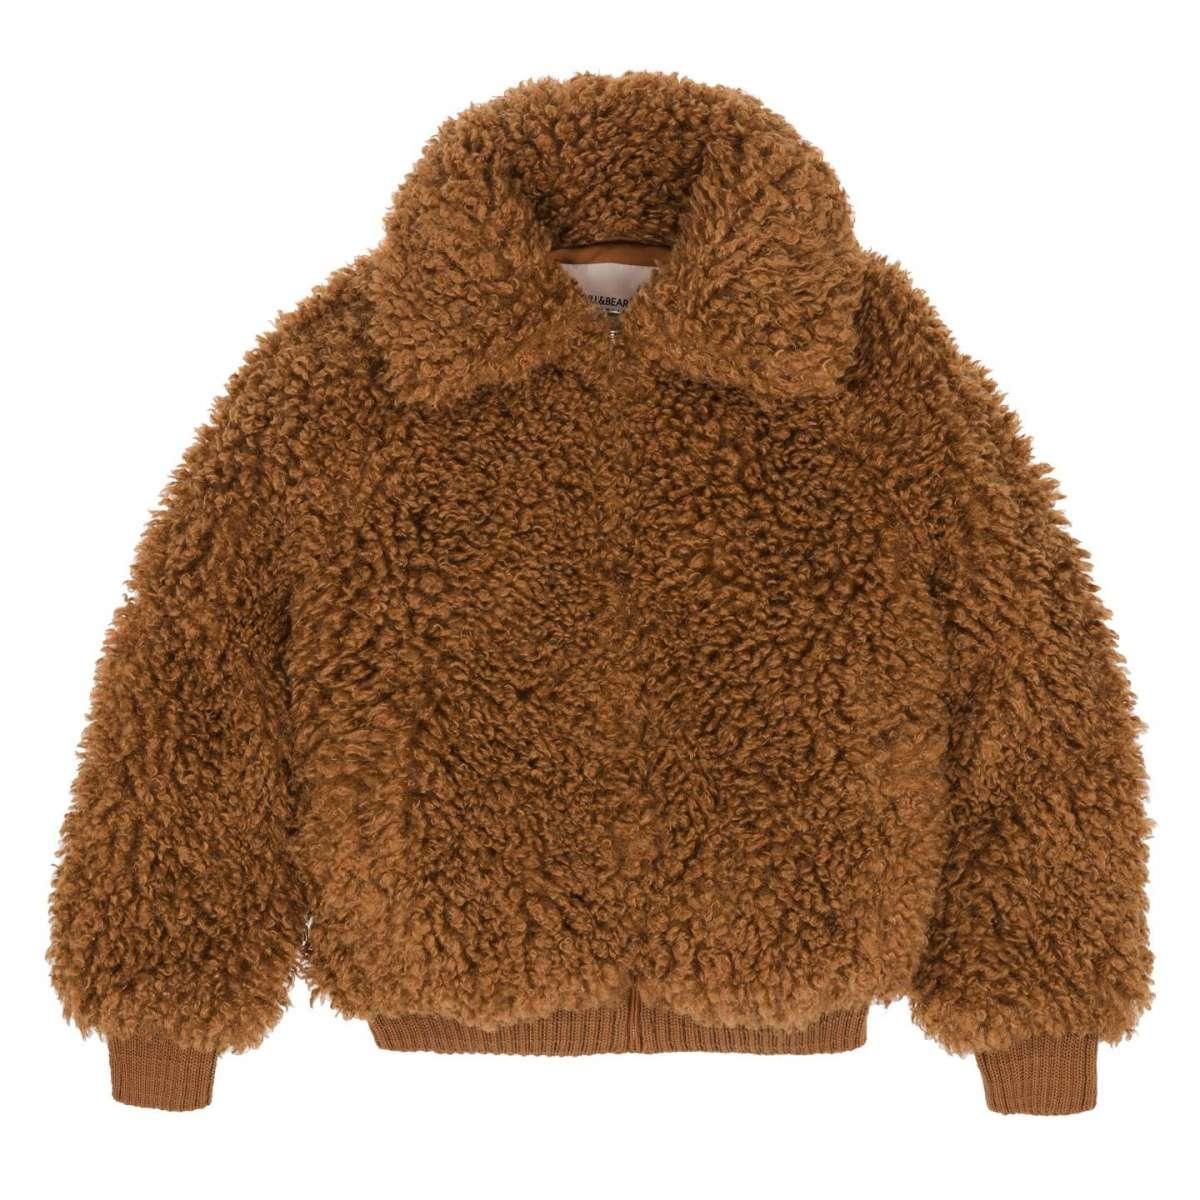 Giubbotto in pelliccia ecologica Pull and Bear